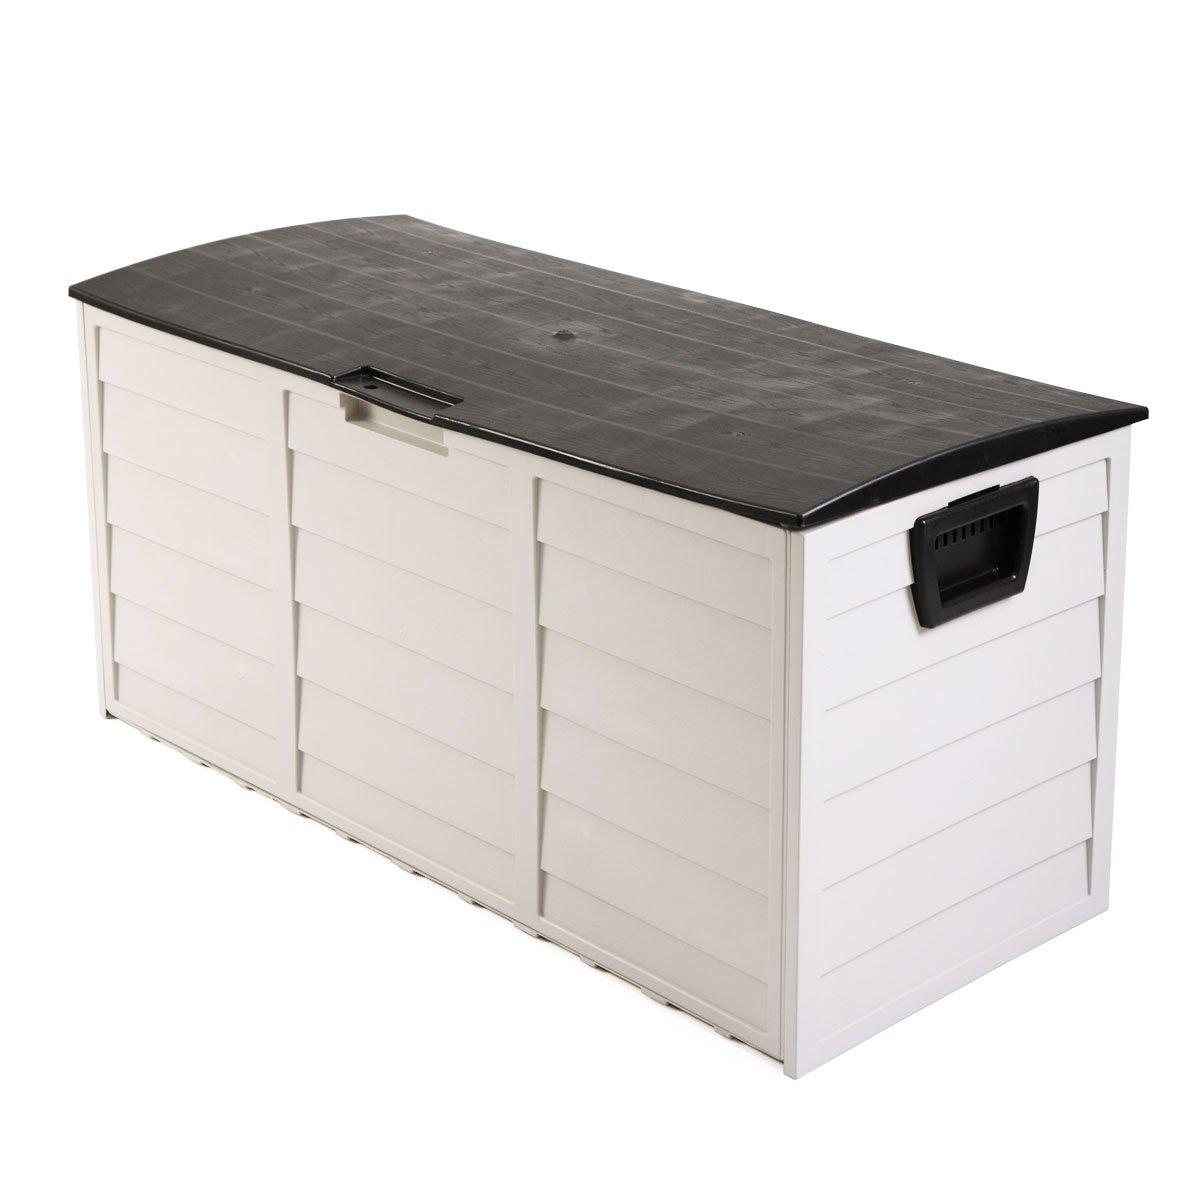 LAZYMOON Outdoor Deck Box Storage Bench Garden Patio Backyard Tool Equipment Container Utility, Gray/Black